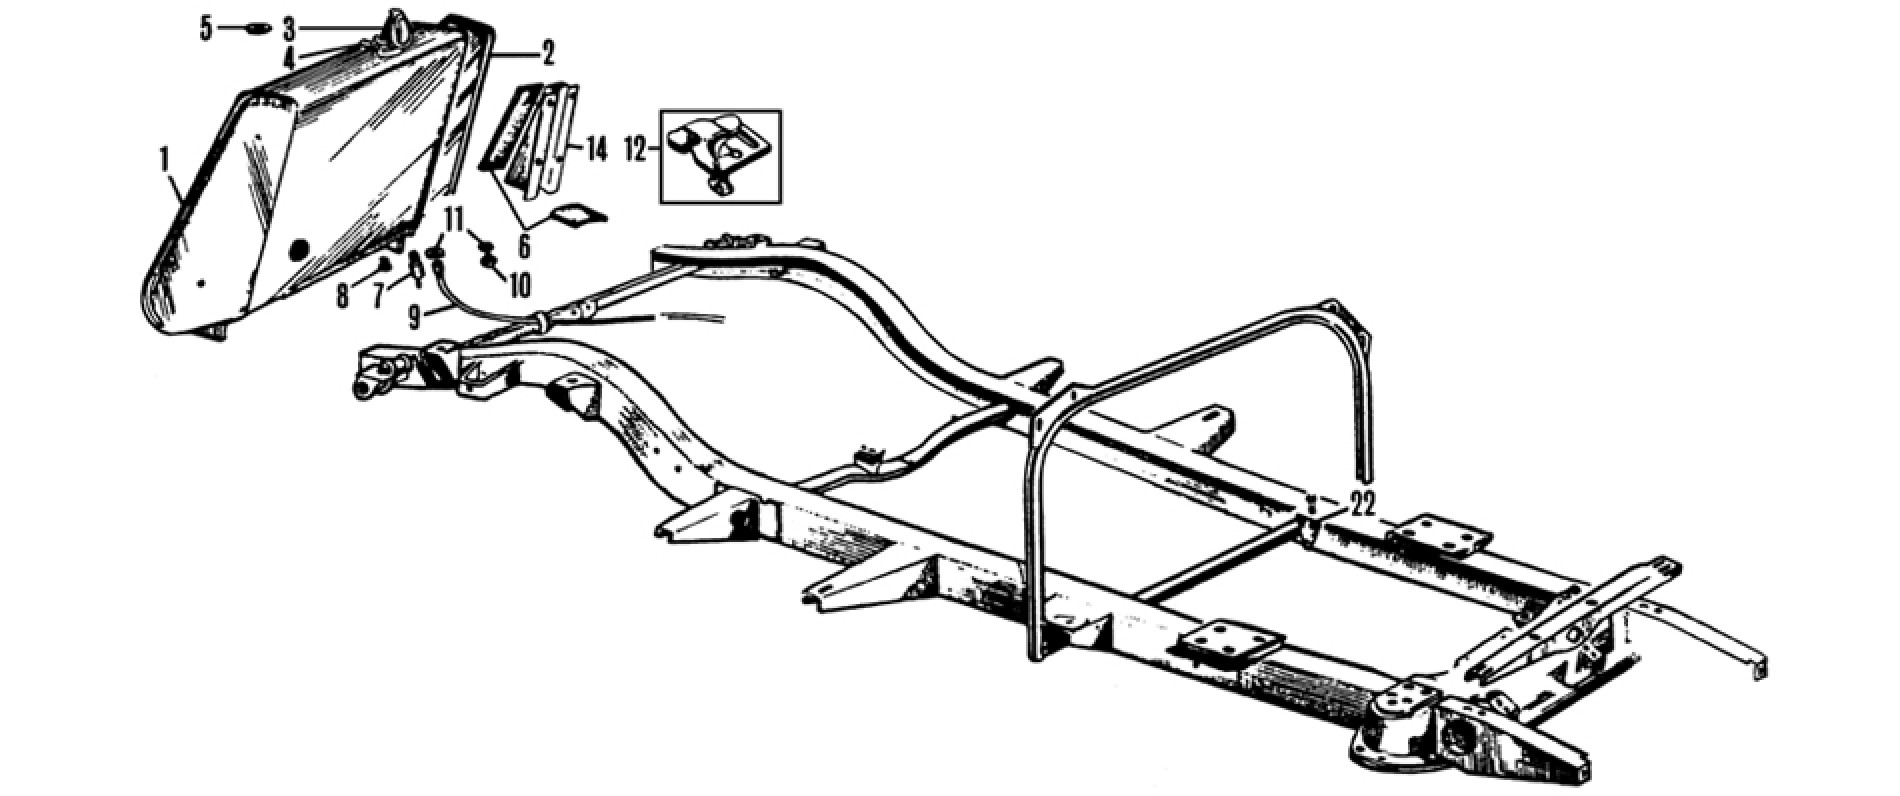 Fuel Tank Pipes Amp Pump